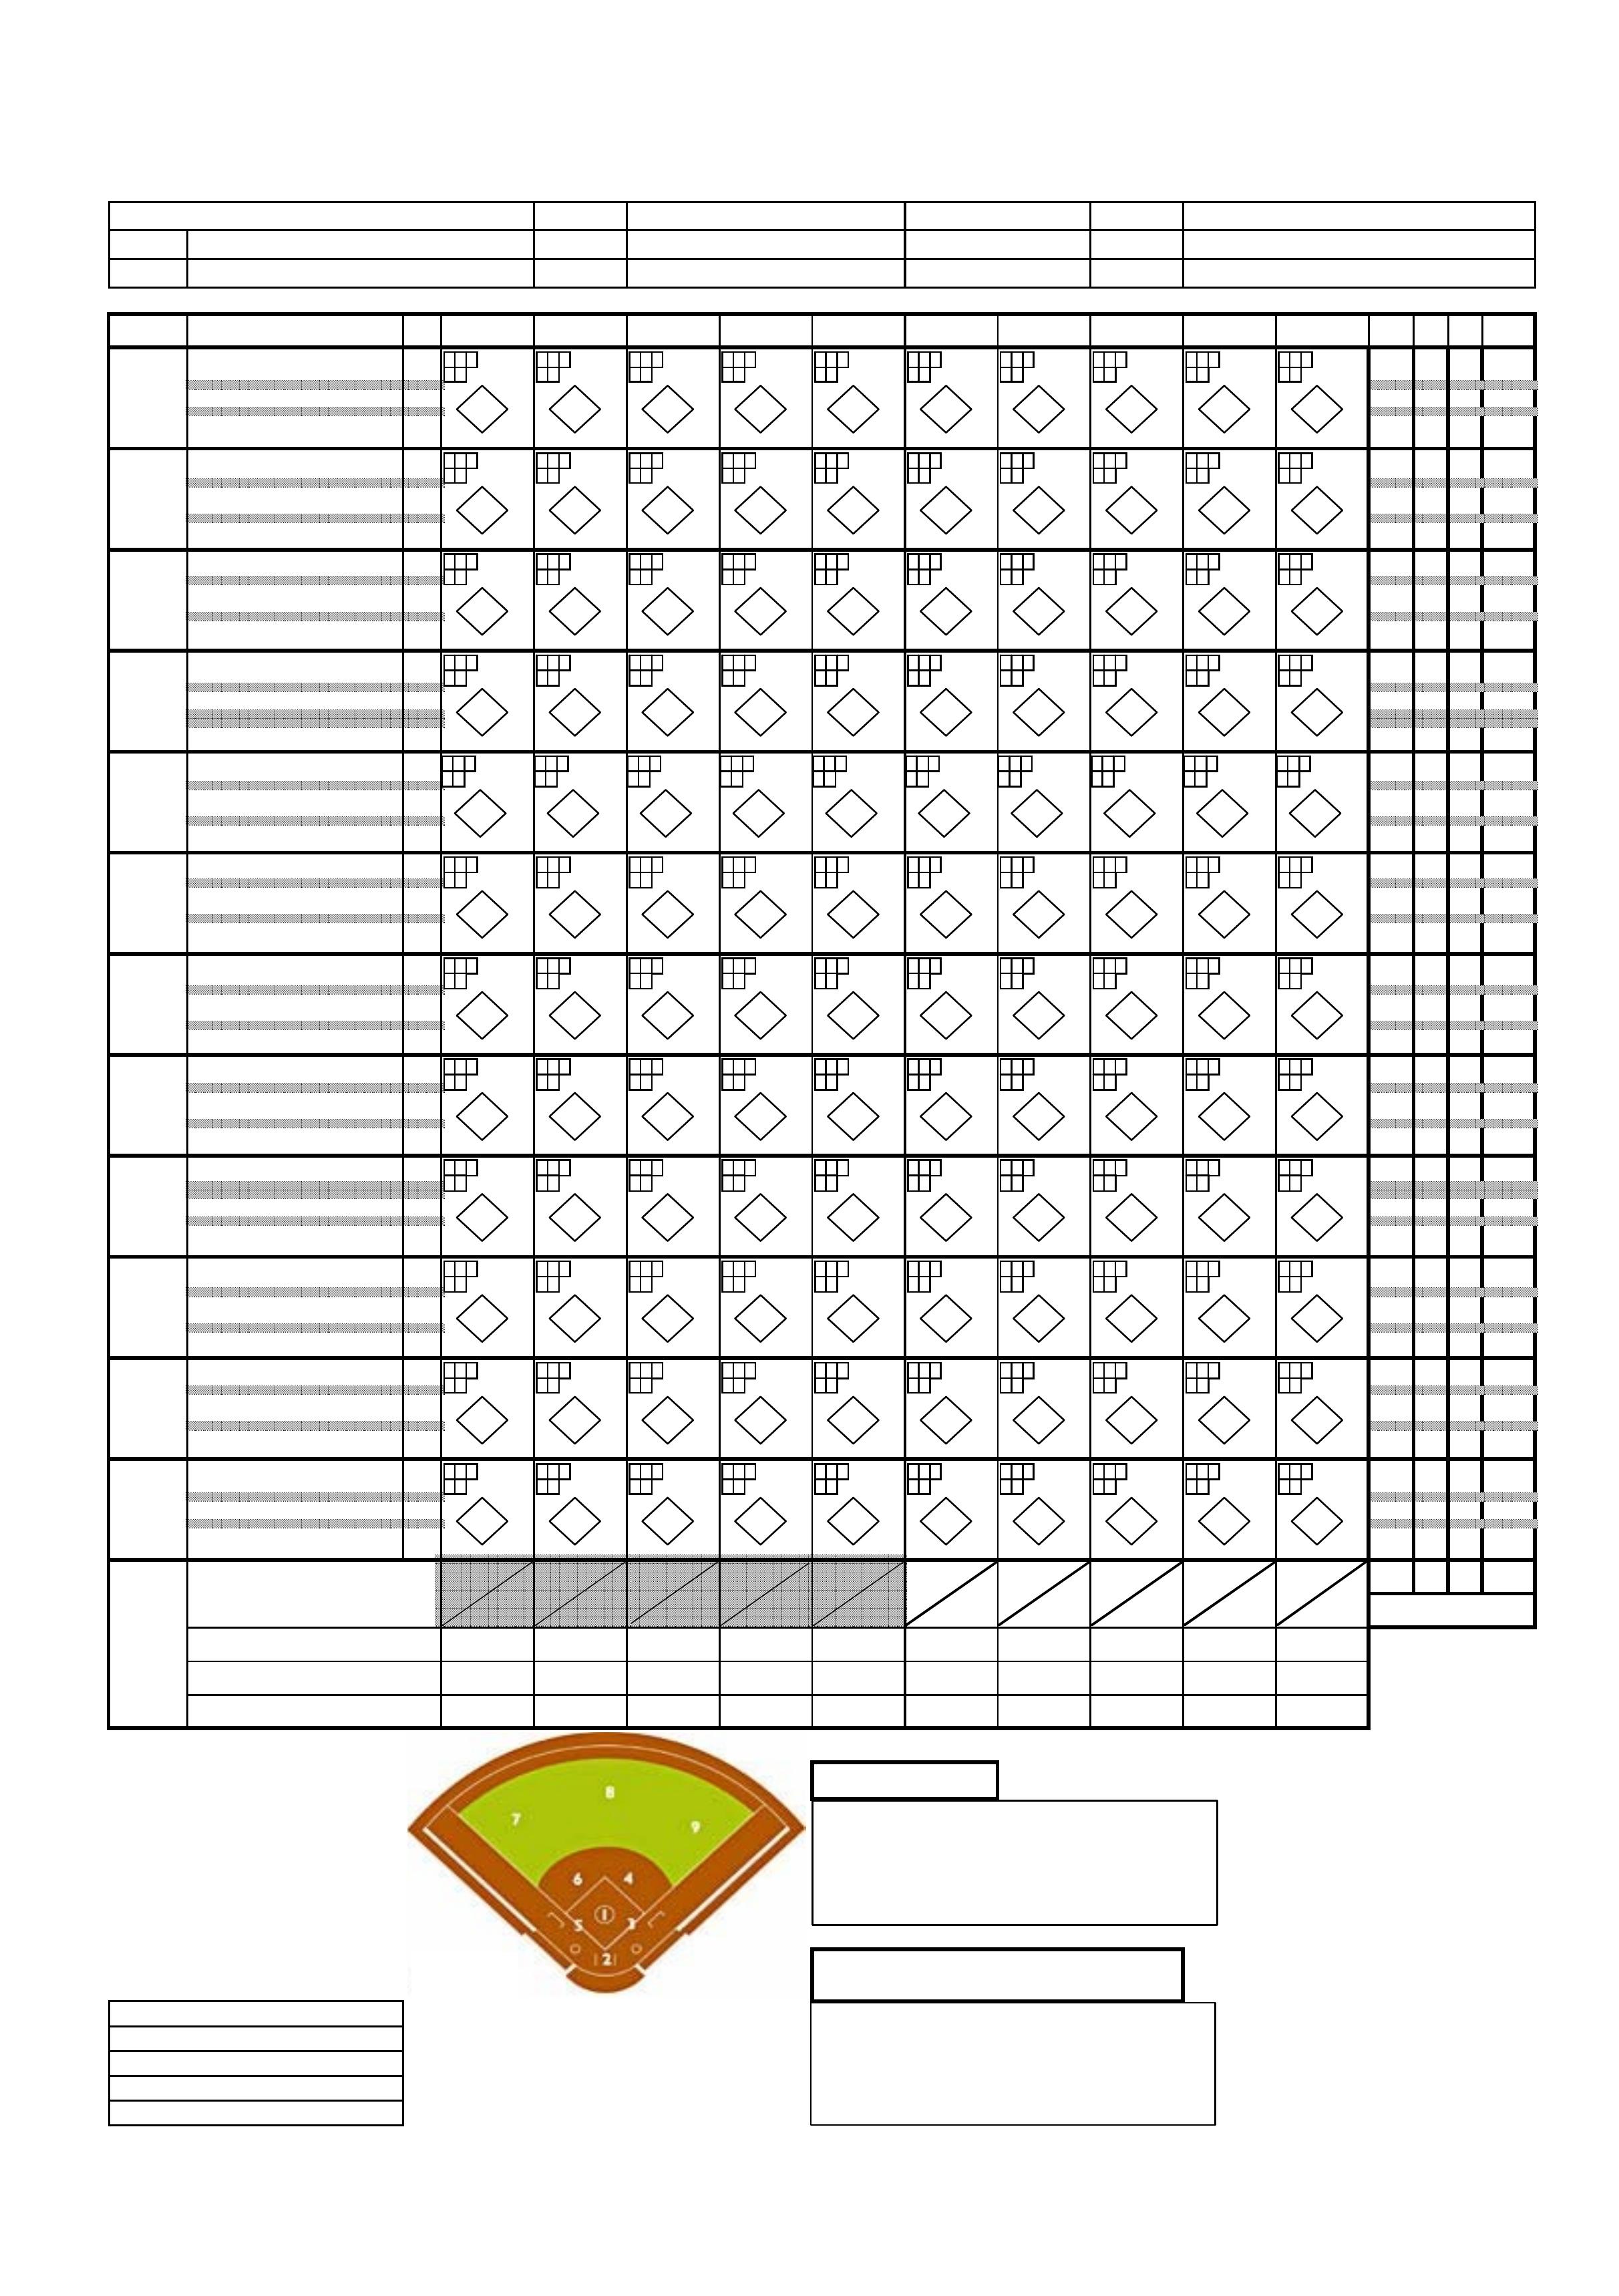 Softball Score Sheet Example Free Download - Free Printable Softball Stat Sheets